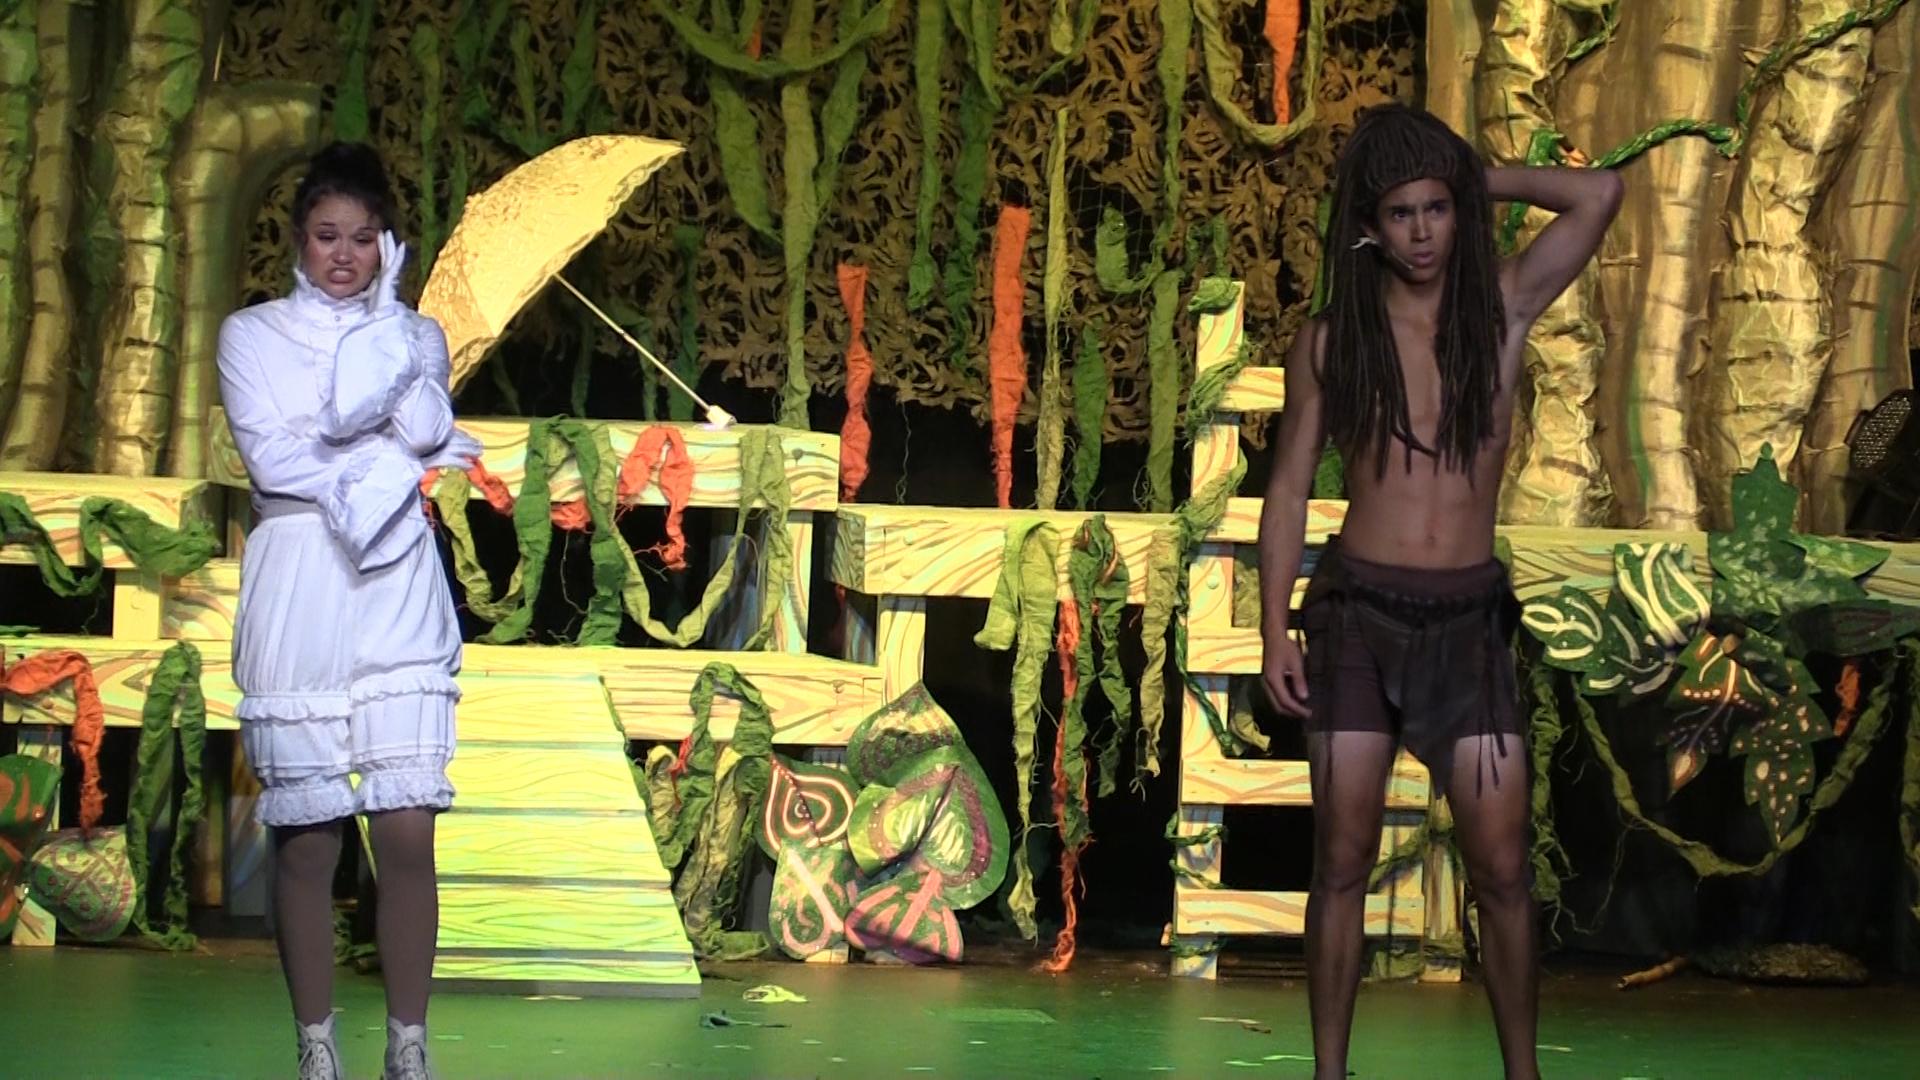 VIDEO - Tarzan swings into the Park